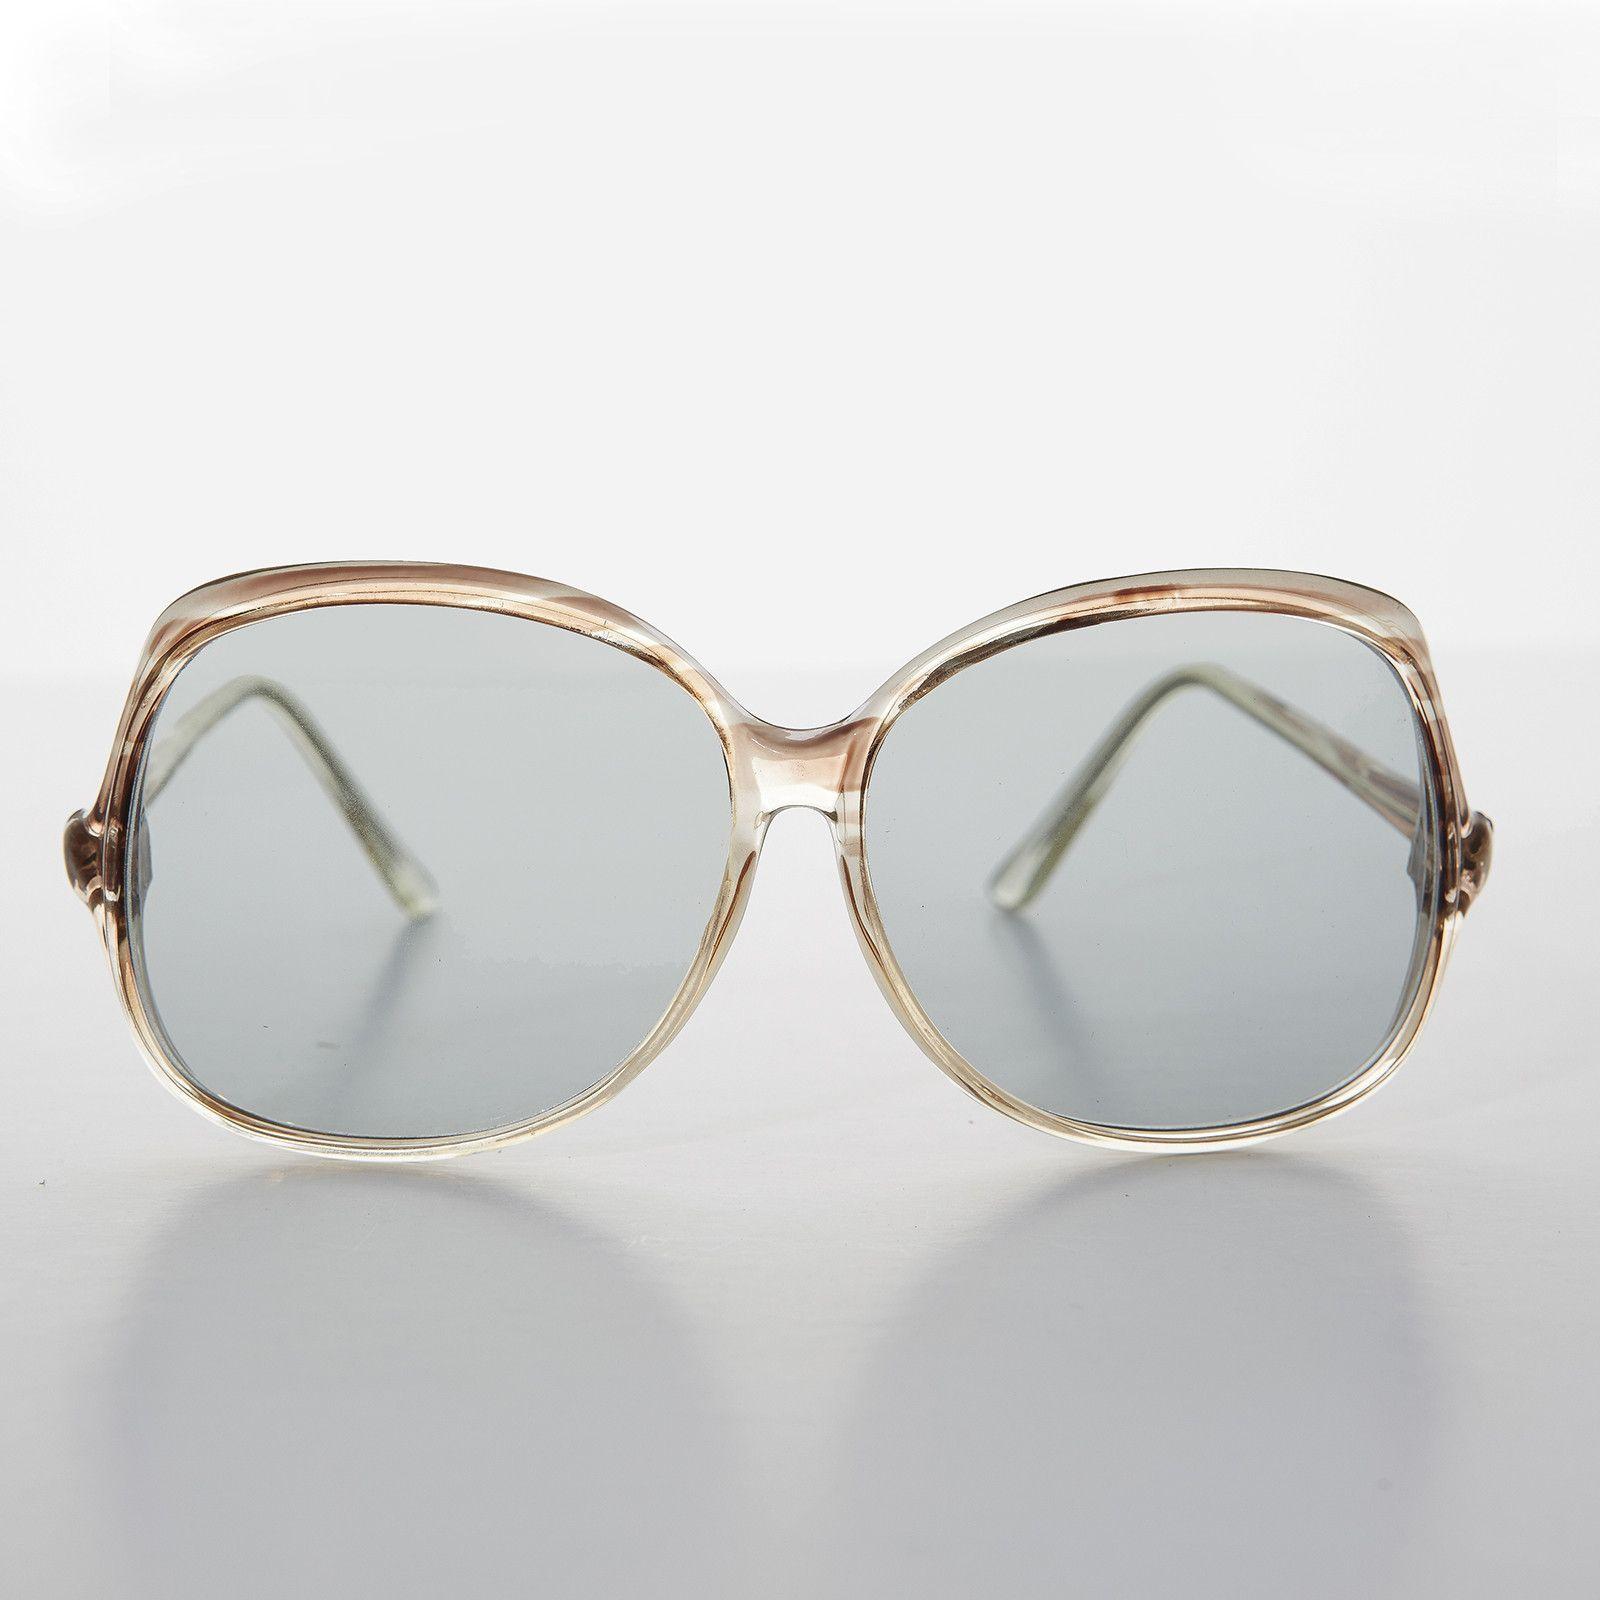 0480a53212 Jackie O Bohemian Oversized Vintage Sunglass with Transition Lens NOS  -OLIVIA